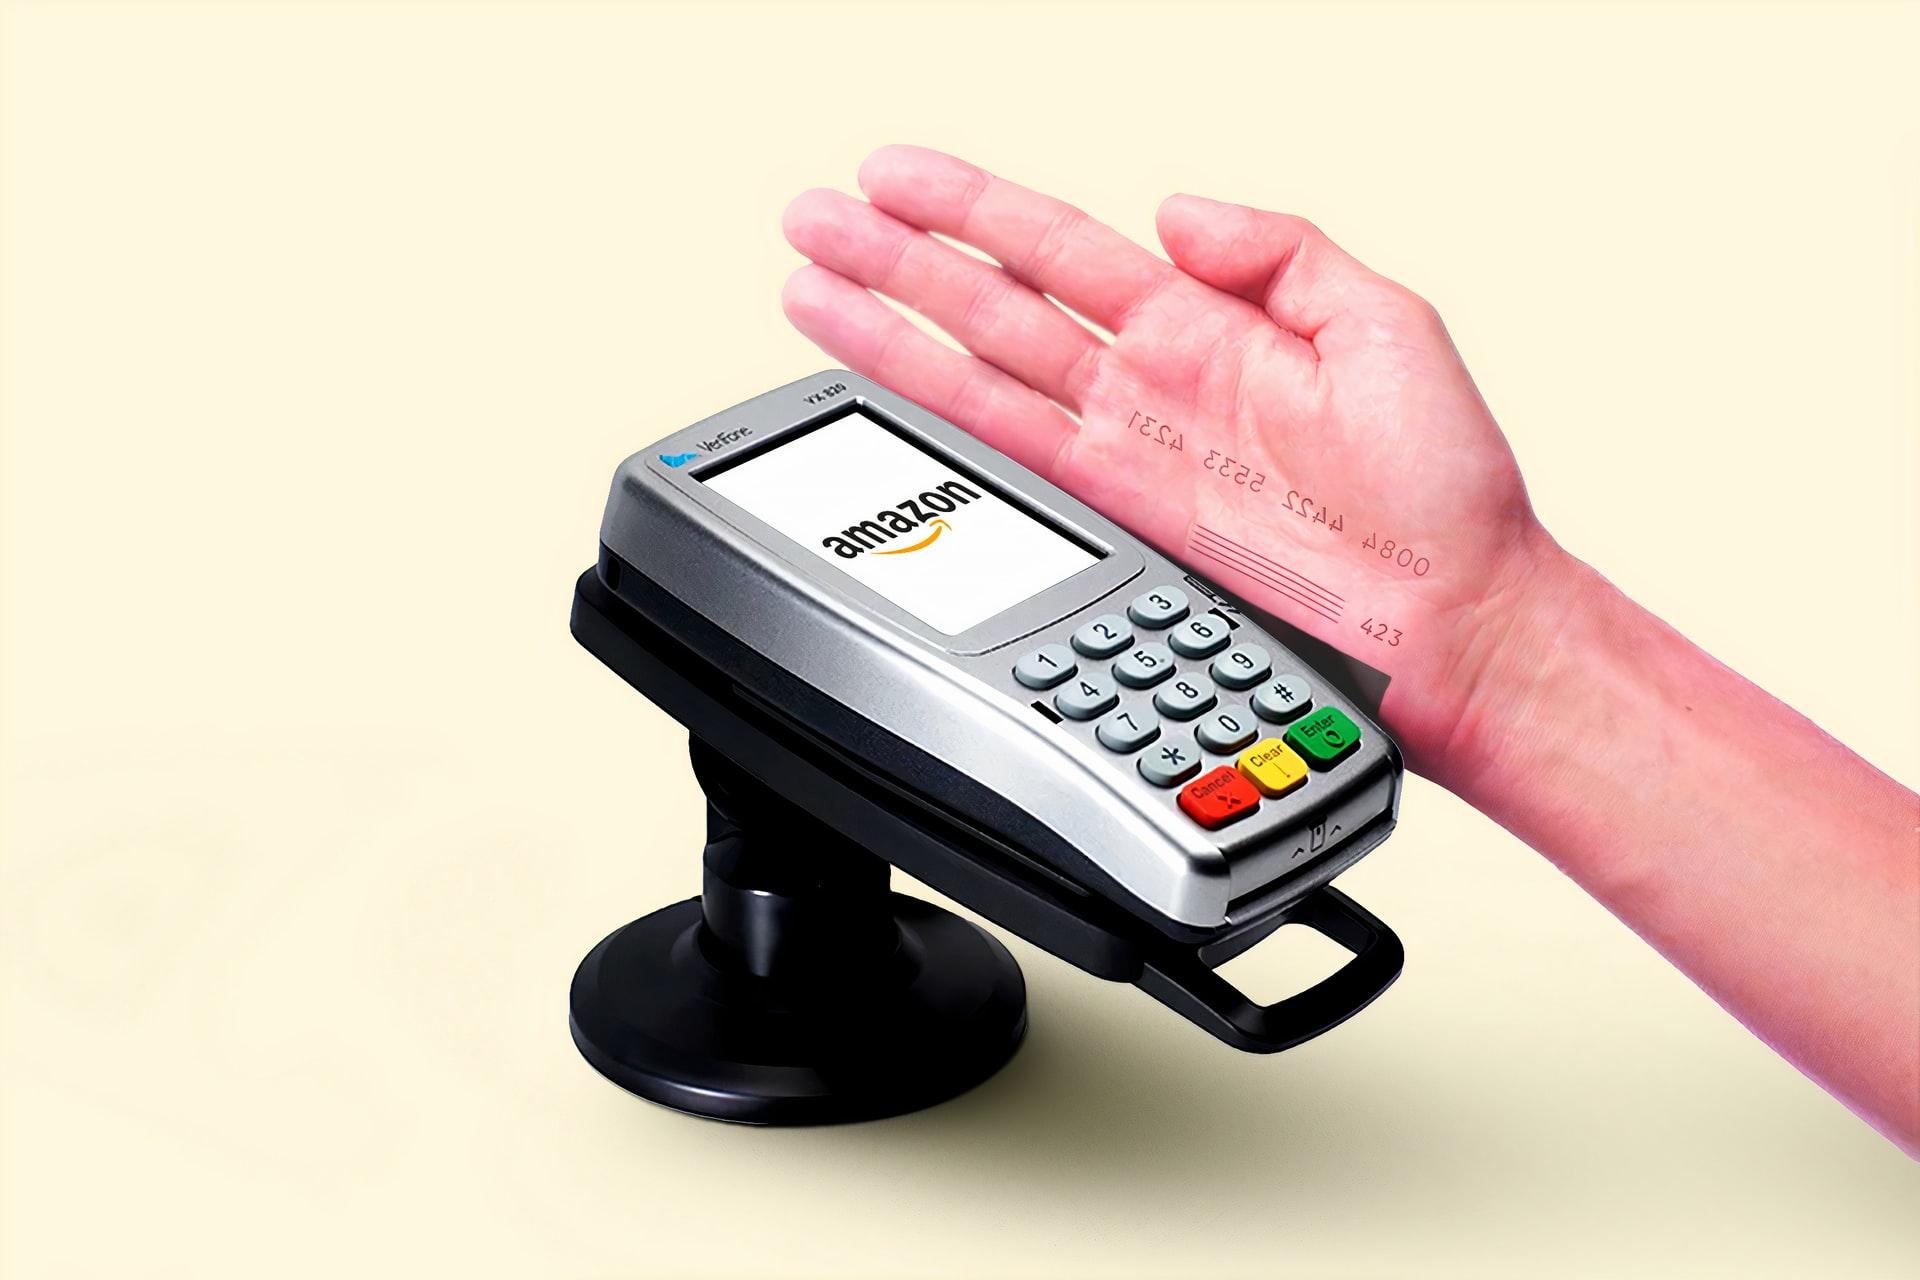 amazon logo on credit card scanner